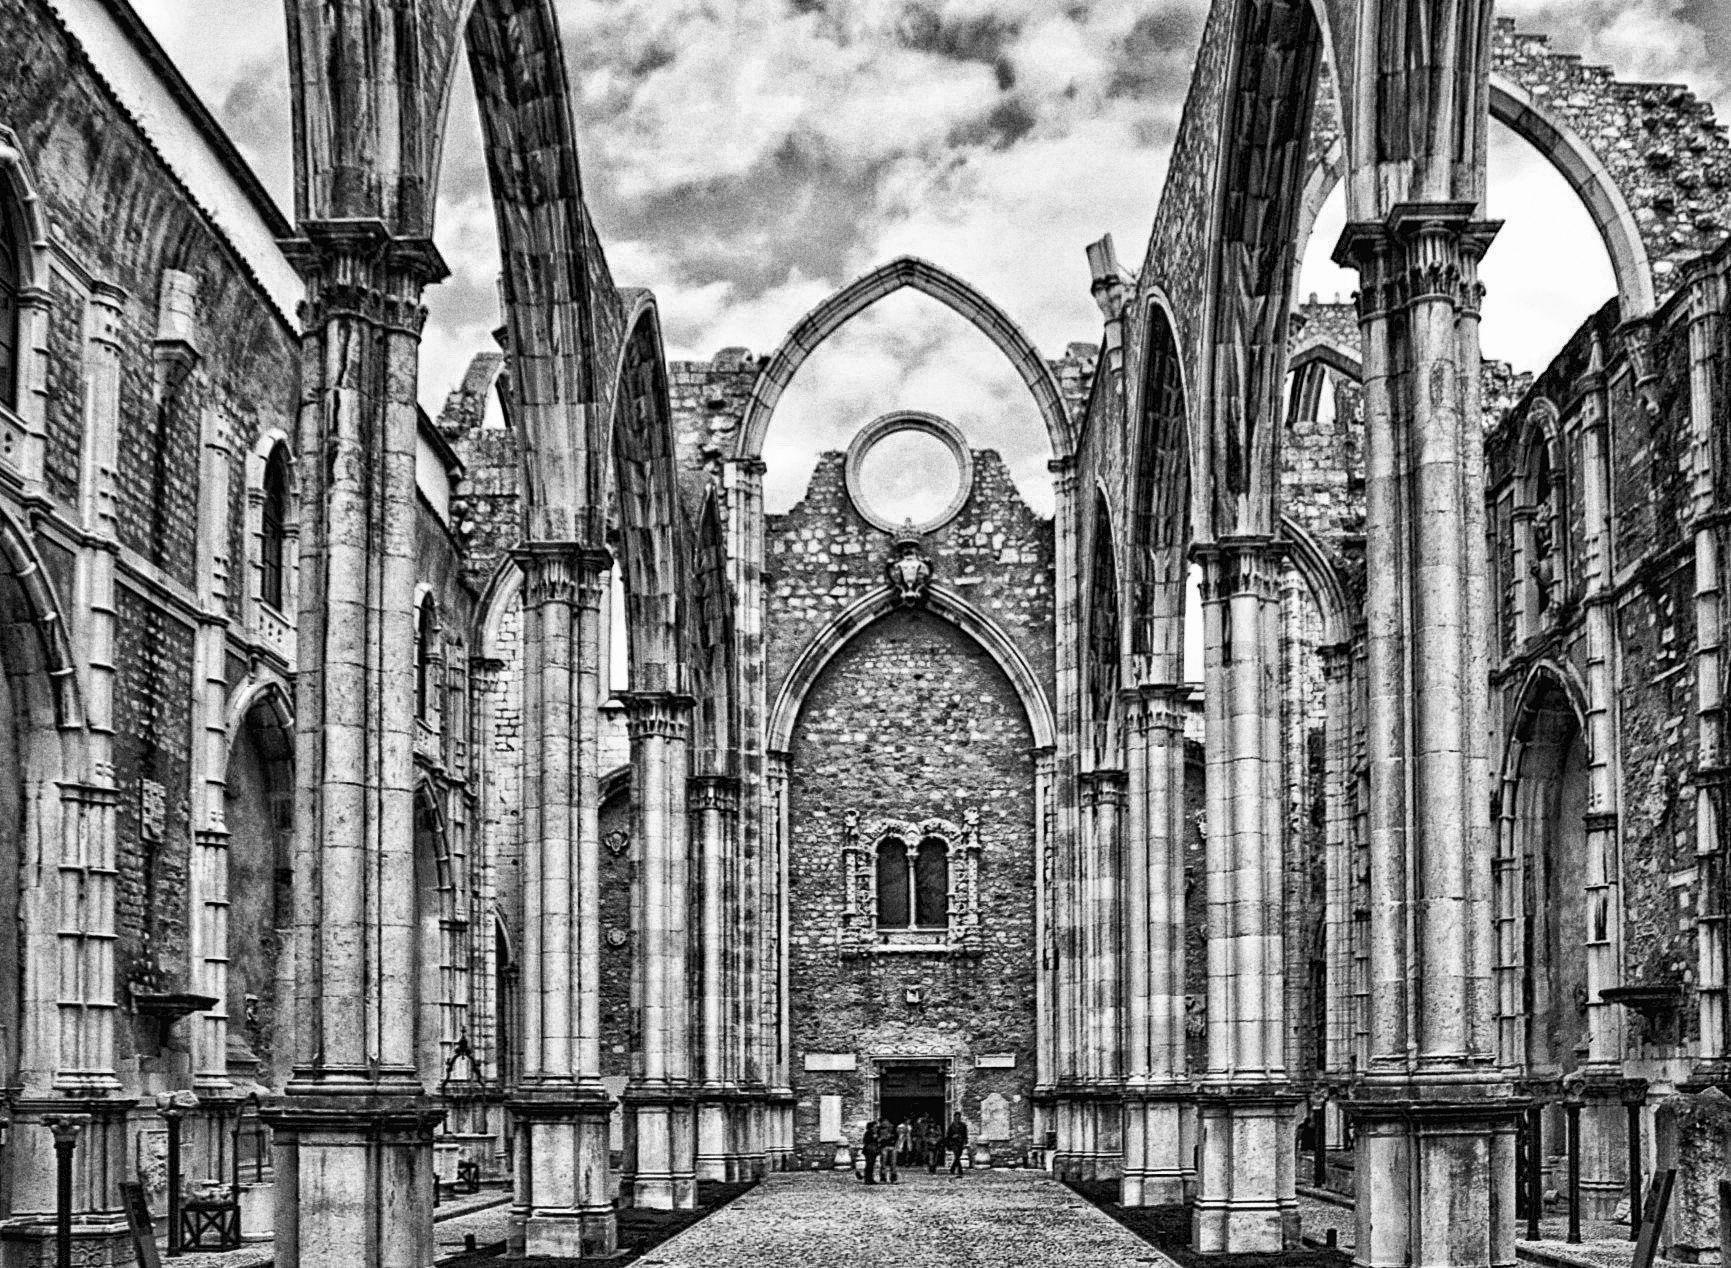 Ruinas do Carmo (Lisbon) by Vítor Martins